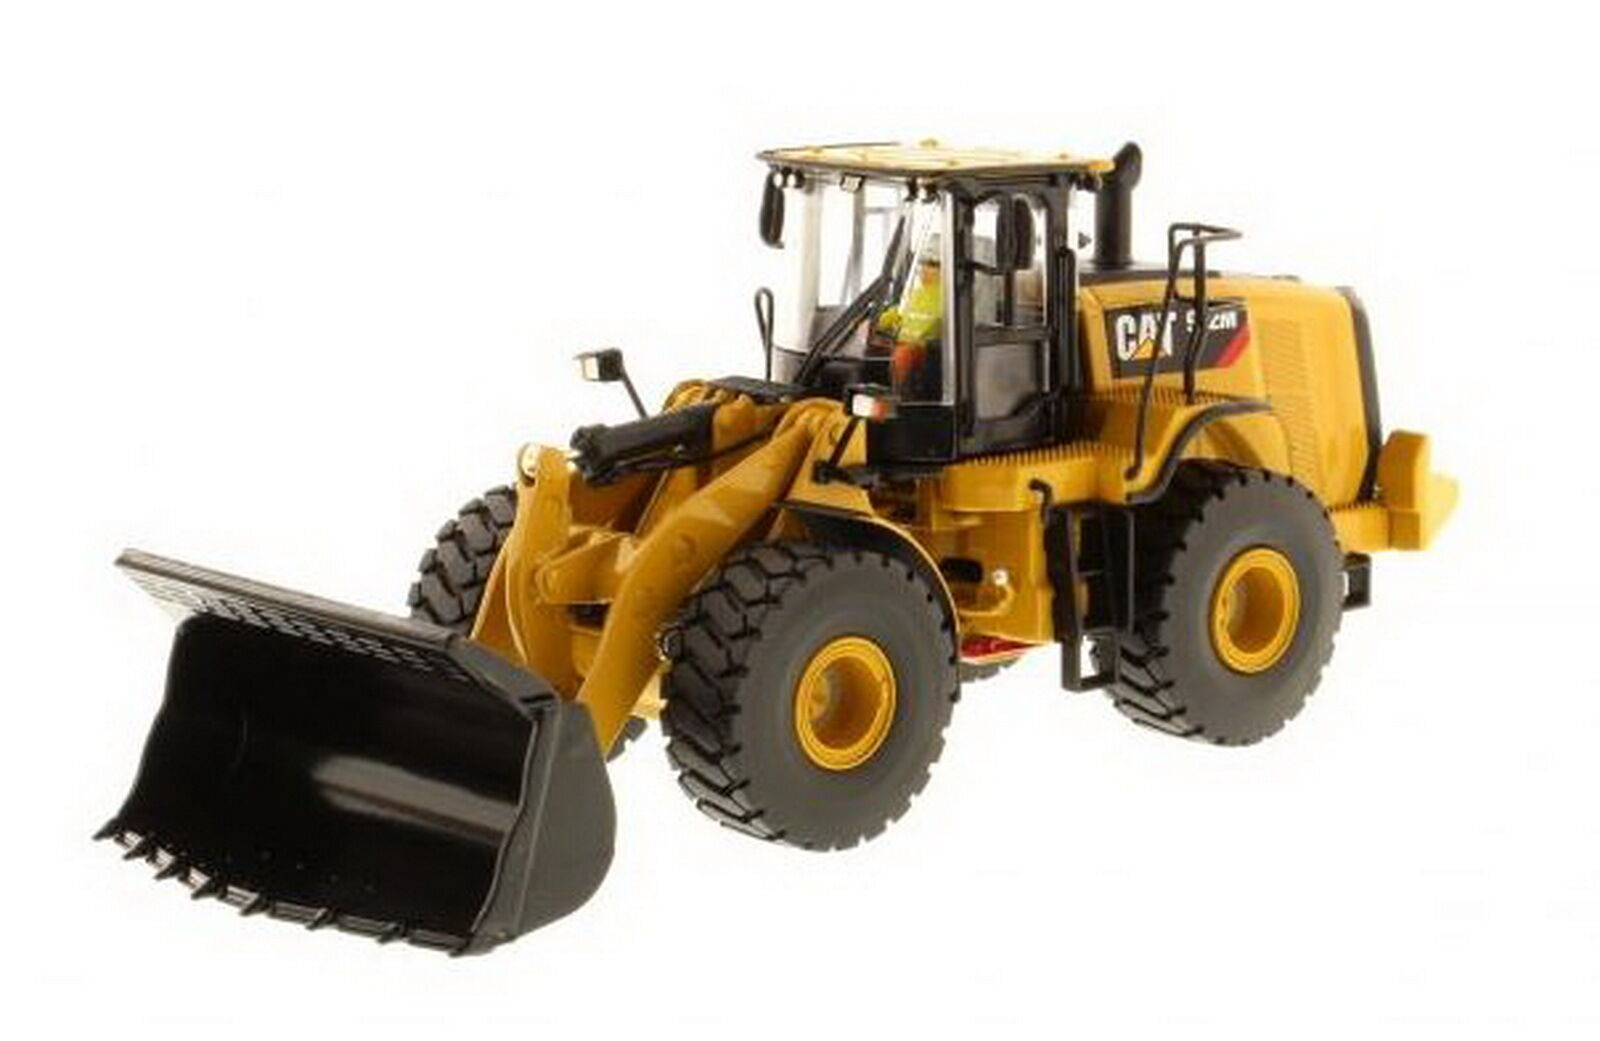 1 50 DM CATERPILLAR CAT 972 M Wheel Loader Diecast Model  85927